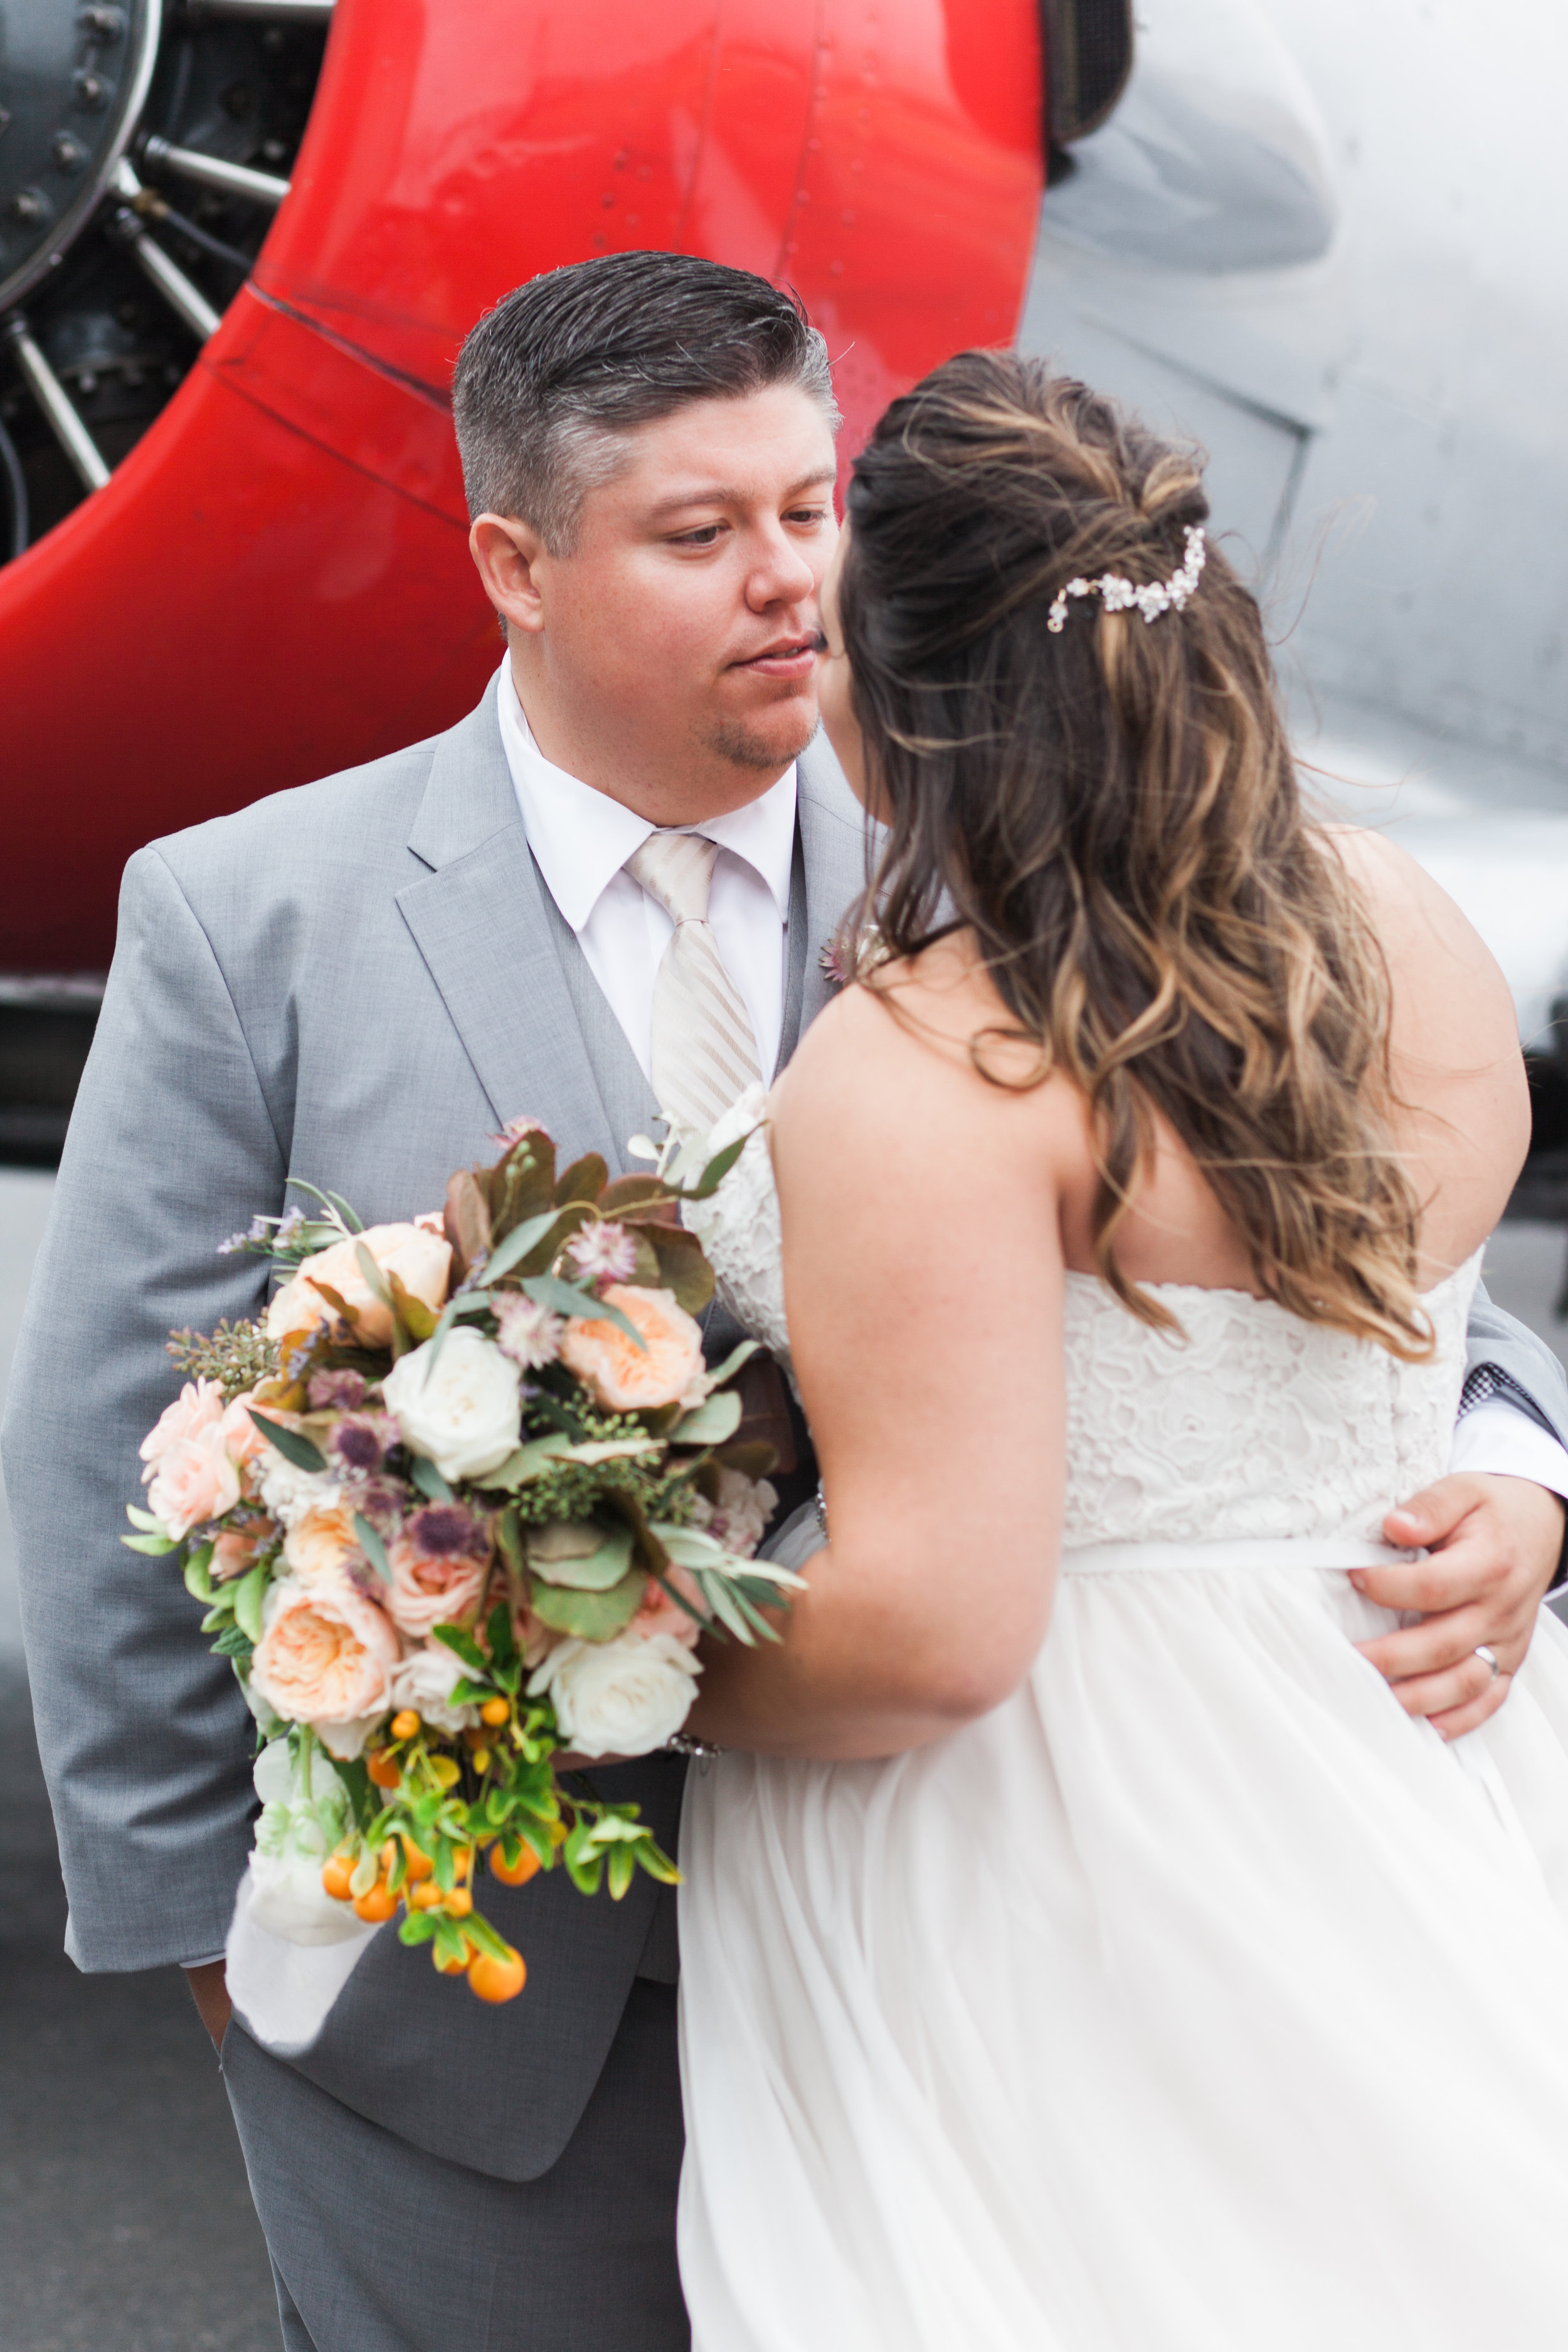 airport-hanger-wedding-at-attitude-aviation-in-livermore-80.jpg